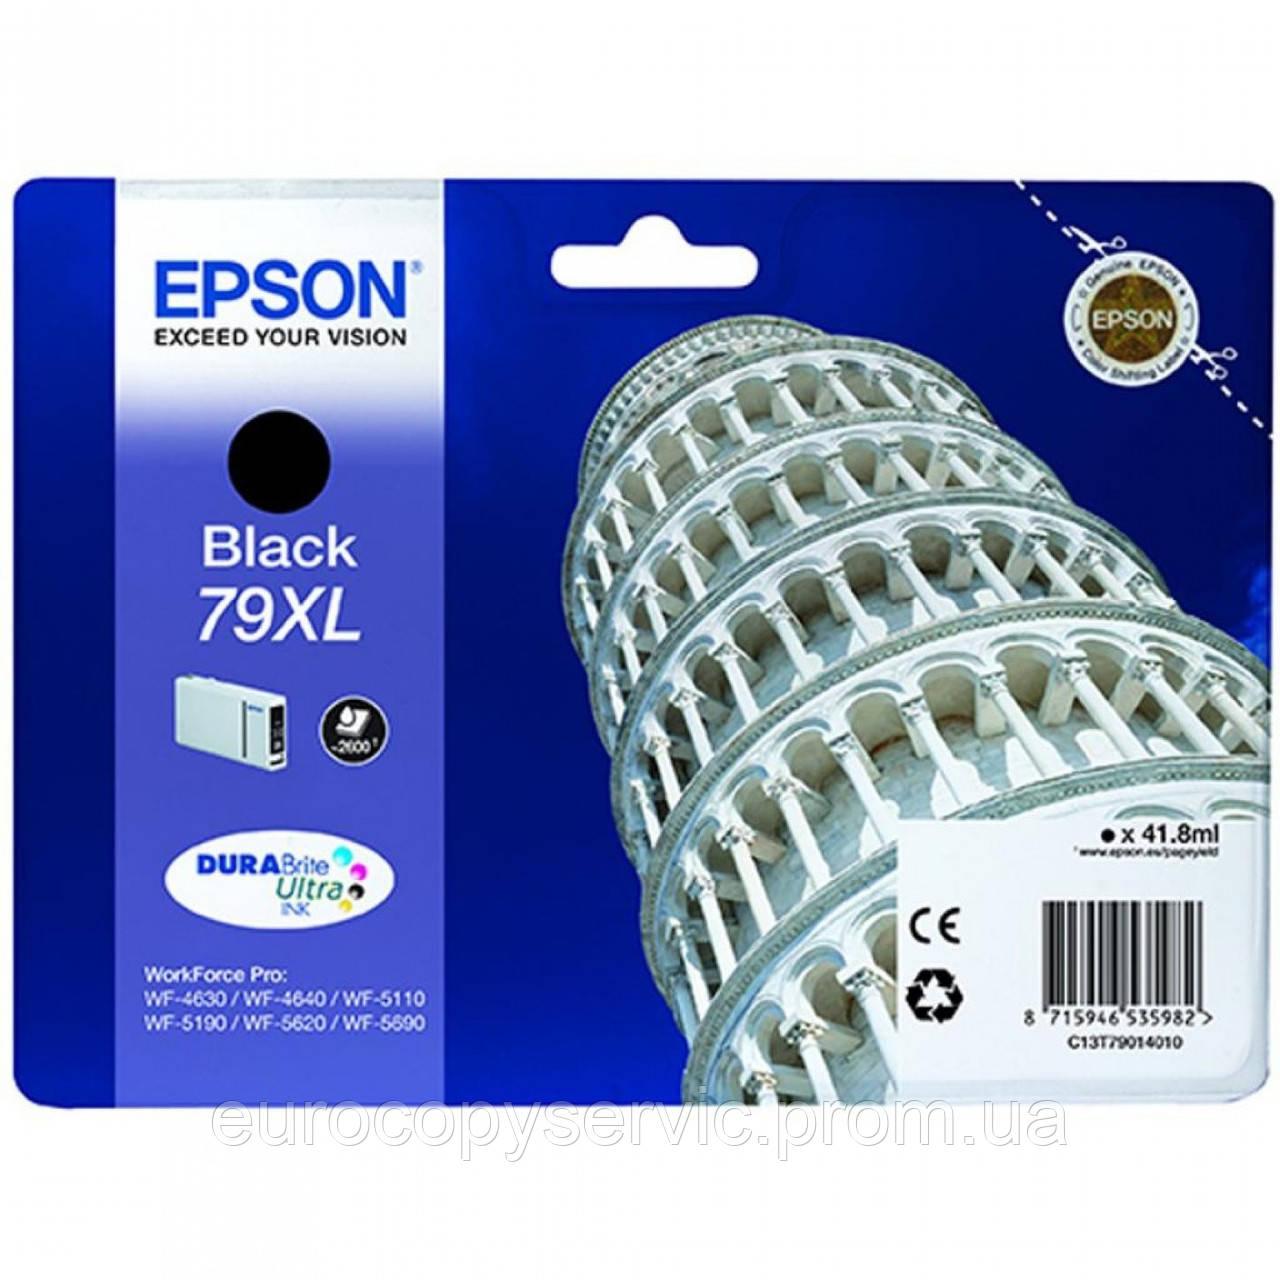 Картридж Epson WF-5110/WF-5620 black XL (C13T79014010) Original